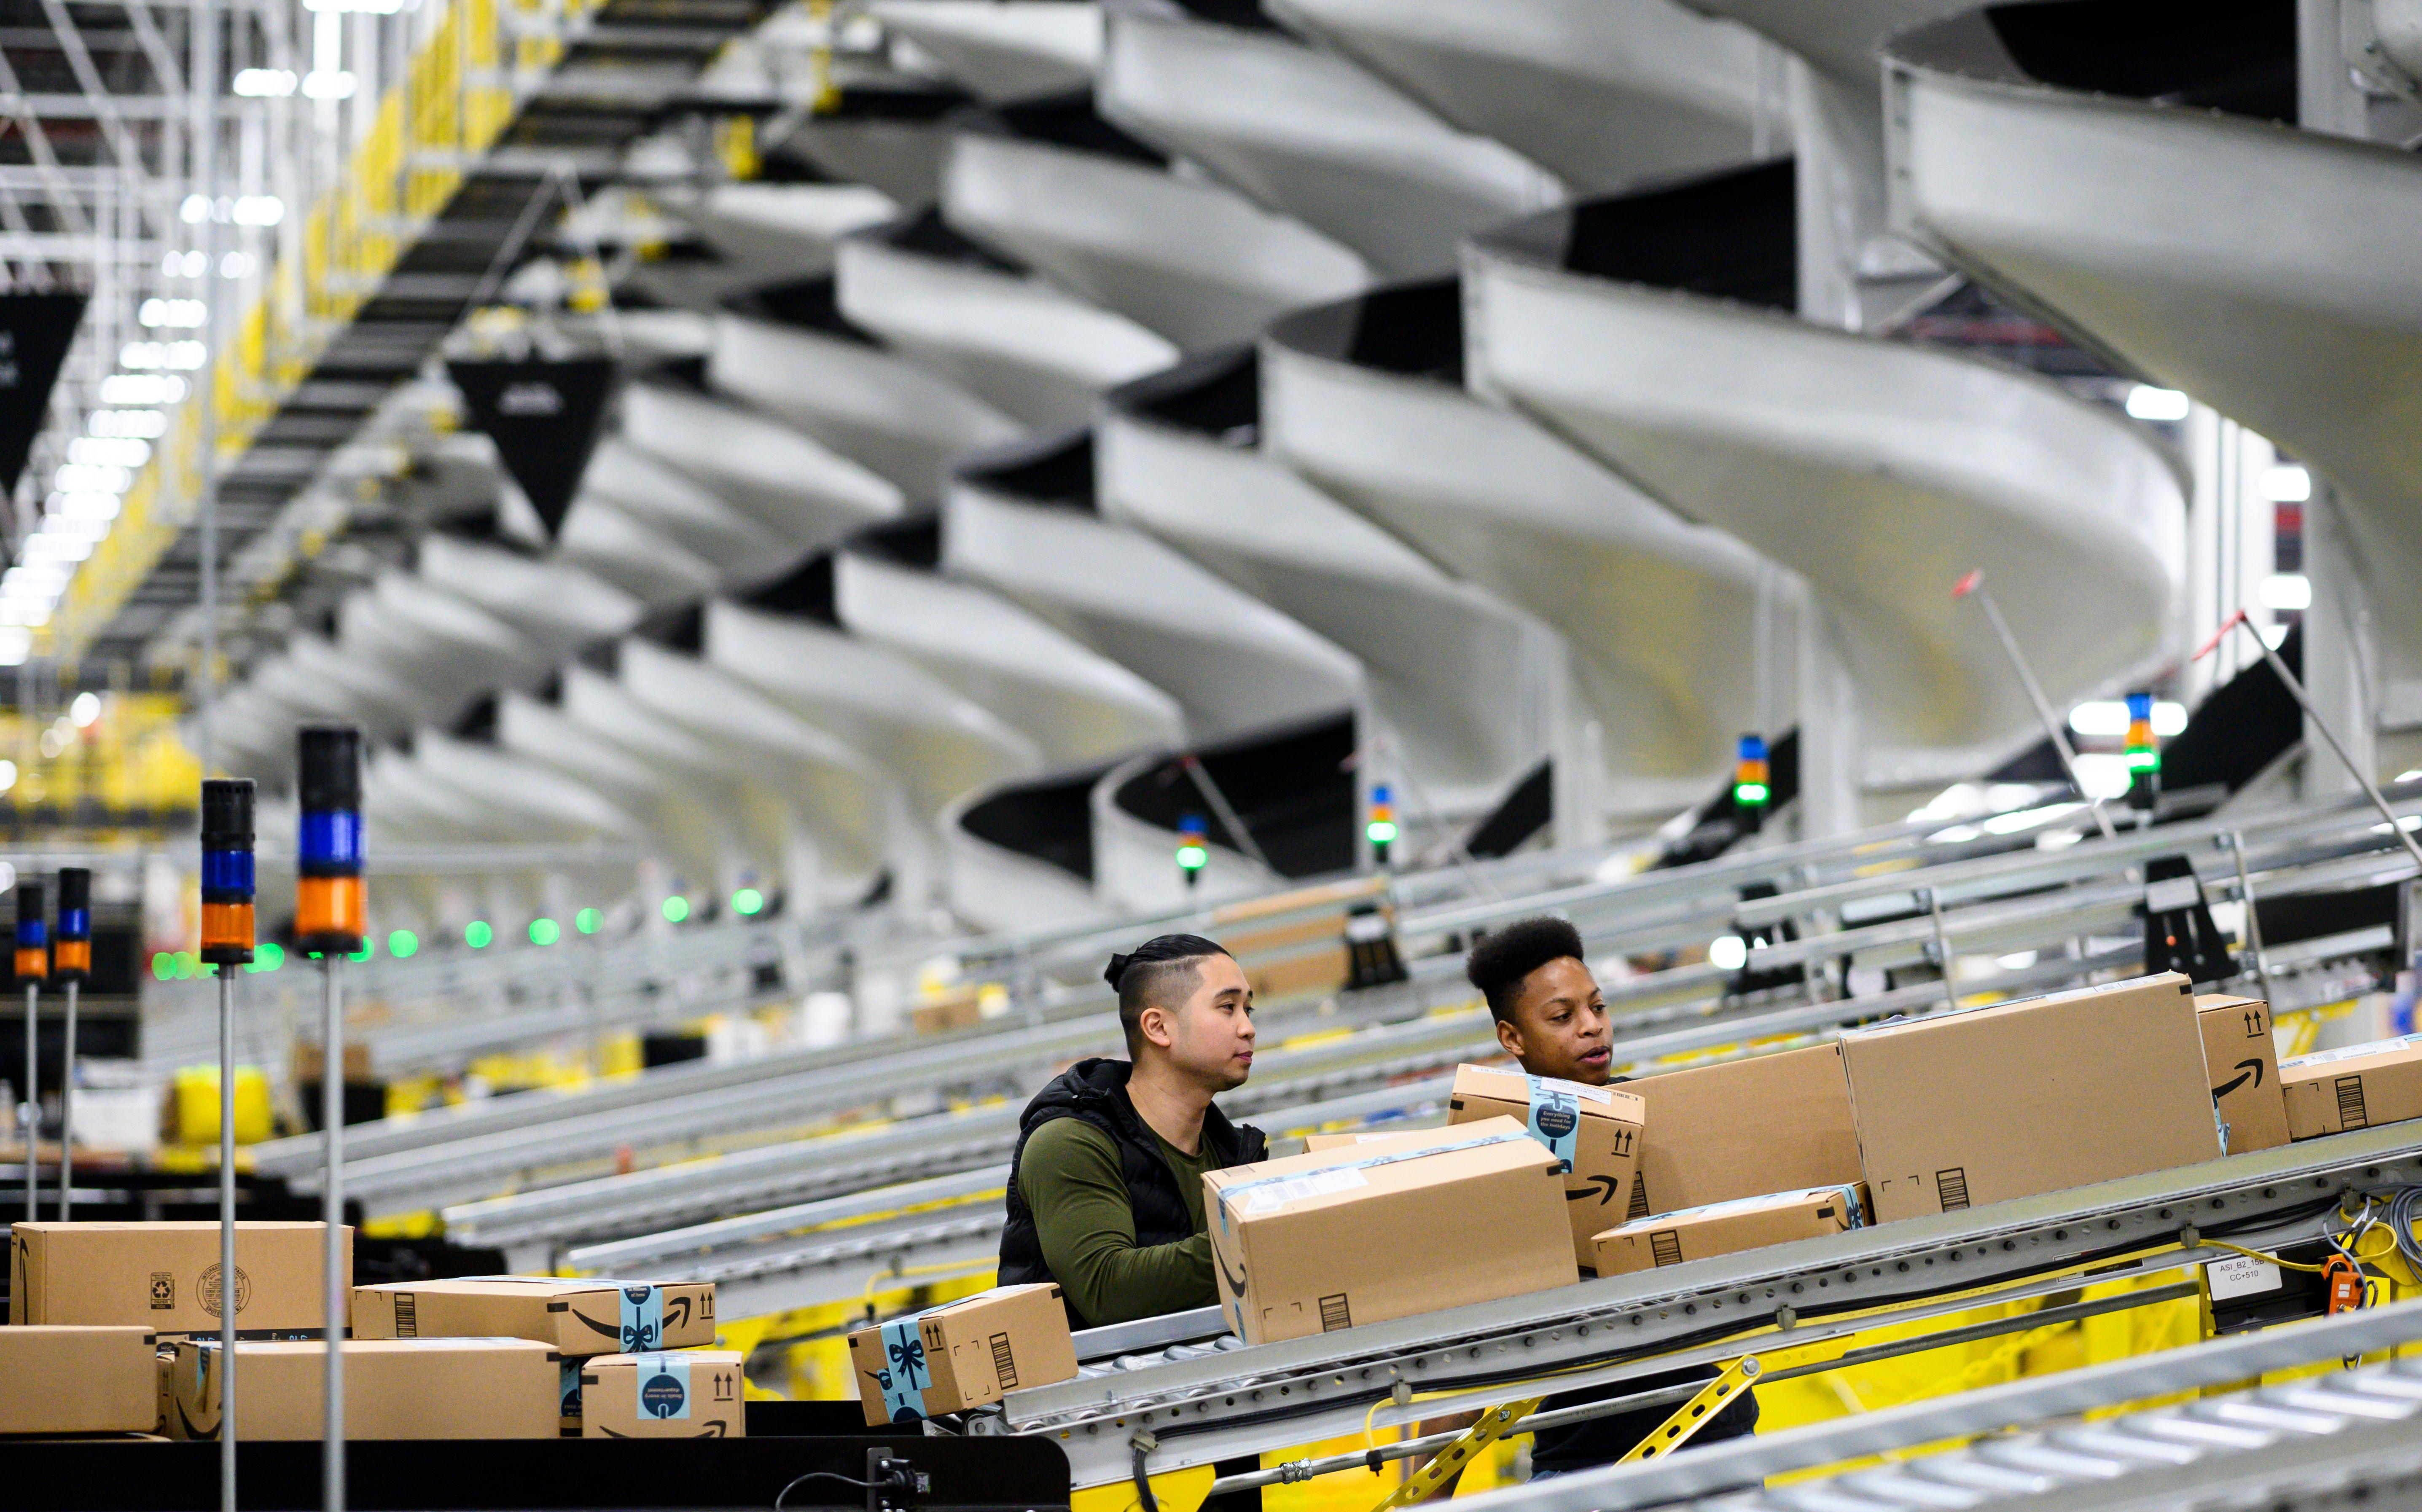 Why Amazon pays warehouse employees to tweet about their jobs